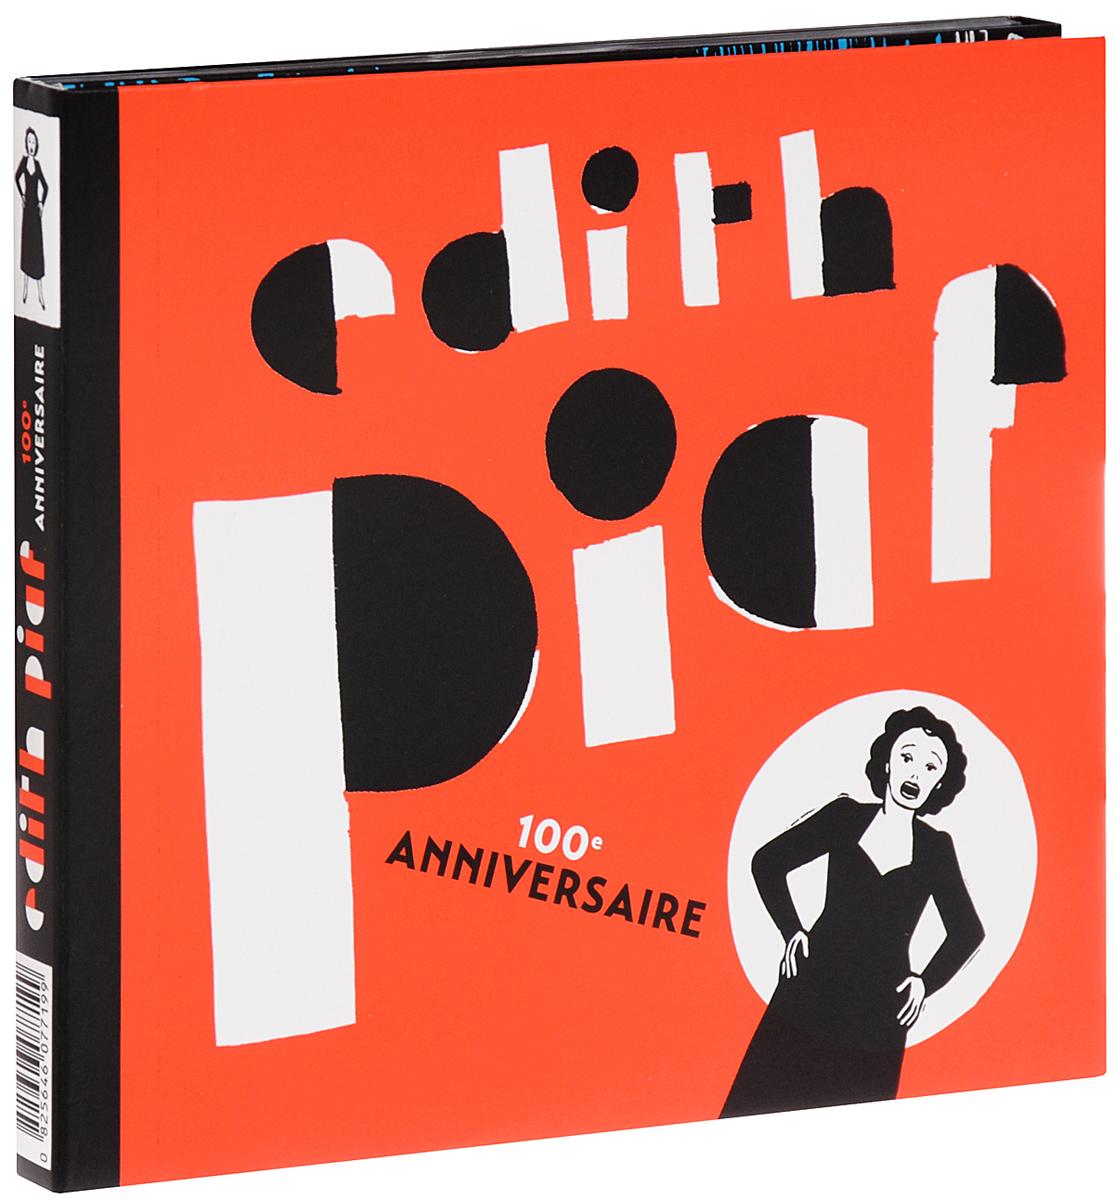 Эдит Пиаф Edith Piaf. 100e Anniversary (2 CD) виниловая пластинка edith piaf edith piaf de l accordeoniste a milord